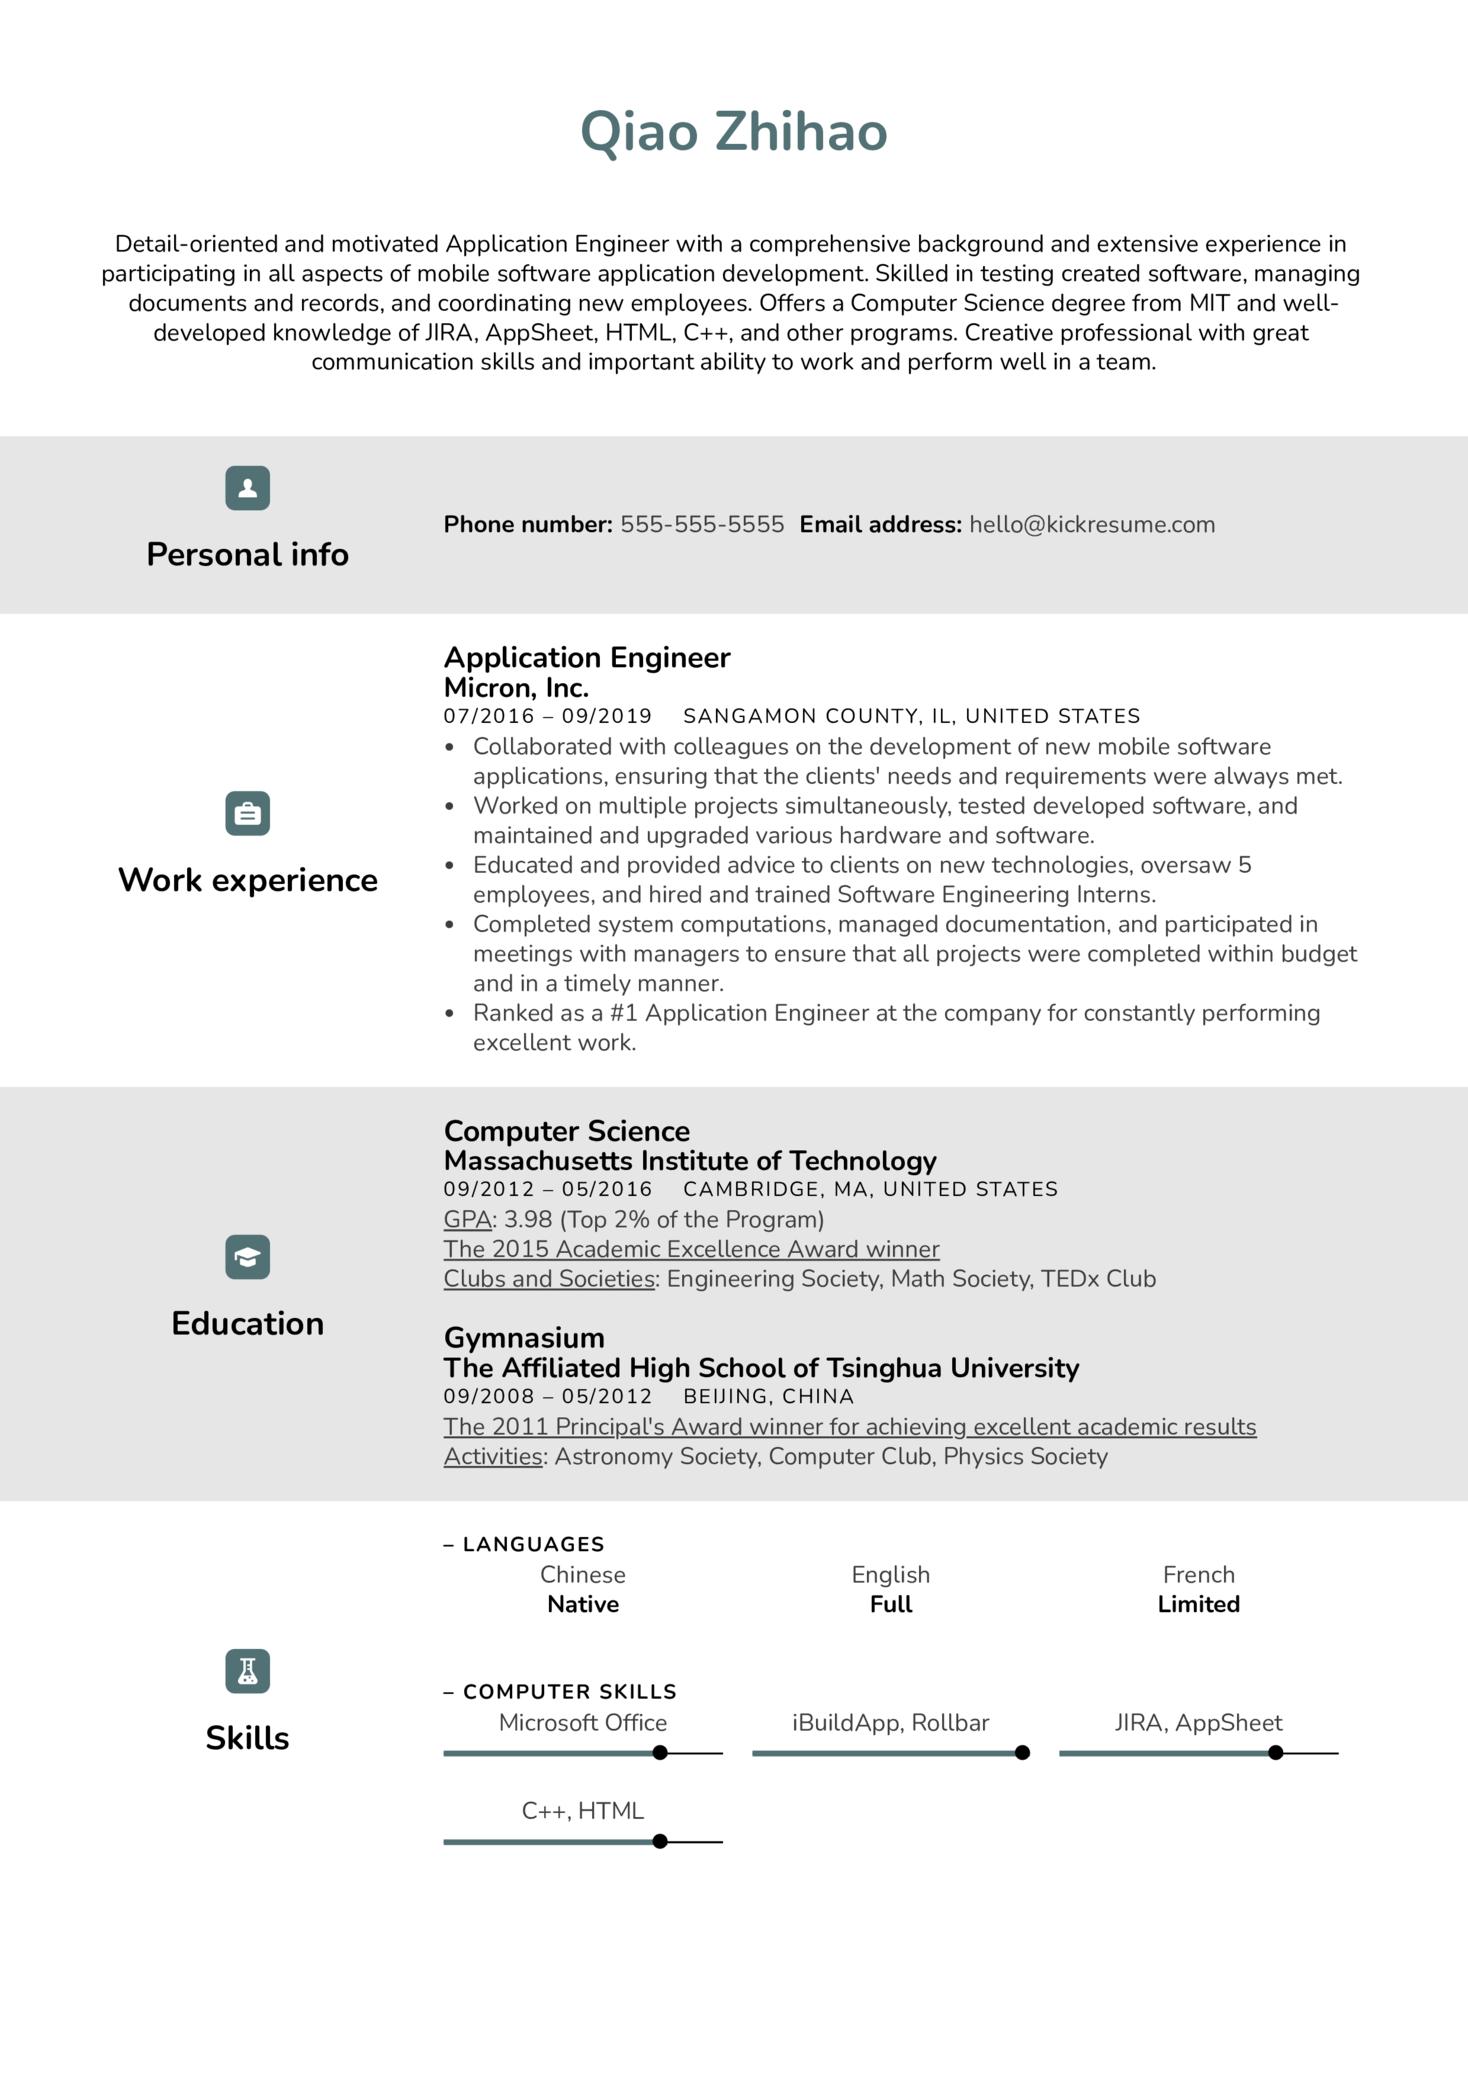 Application Engineer Resume Sample (časť 1)